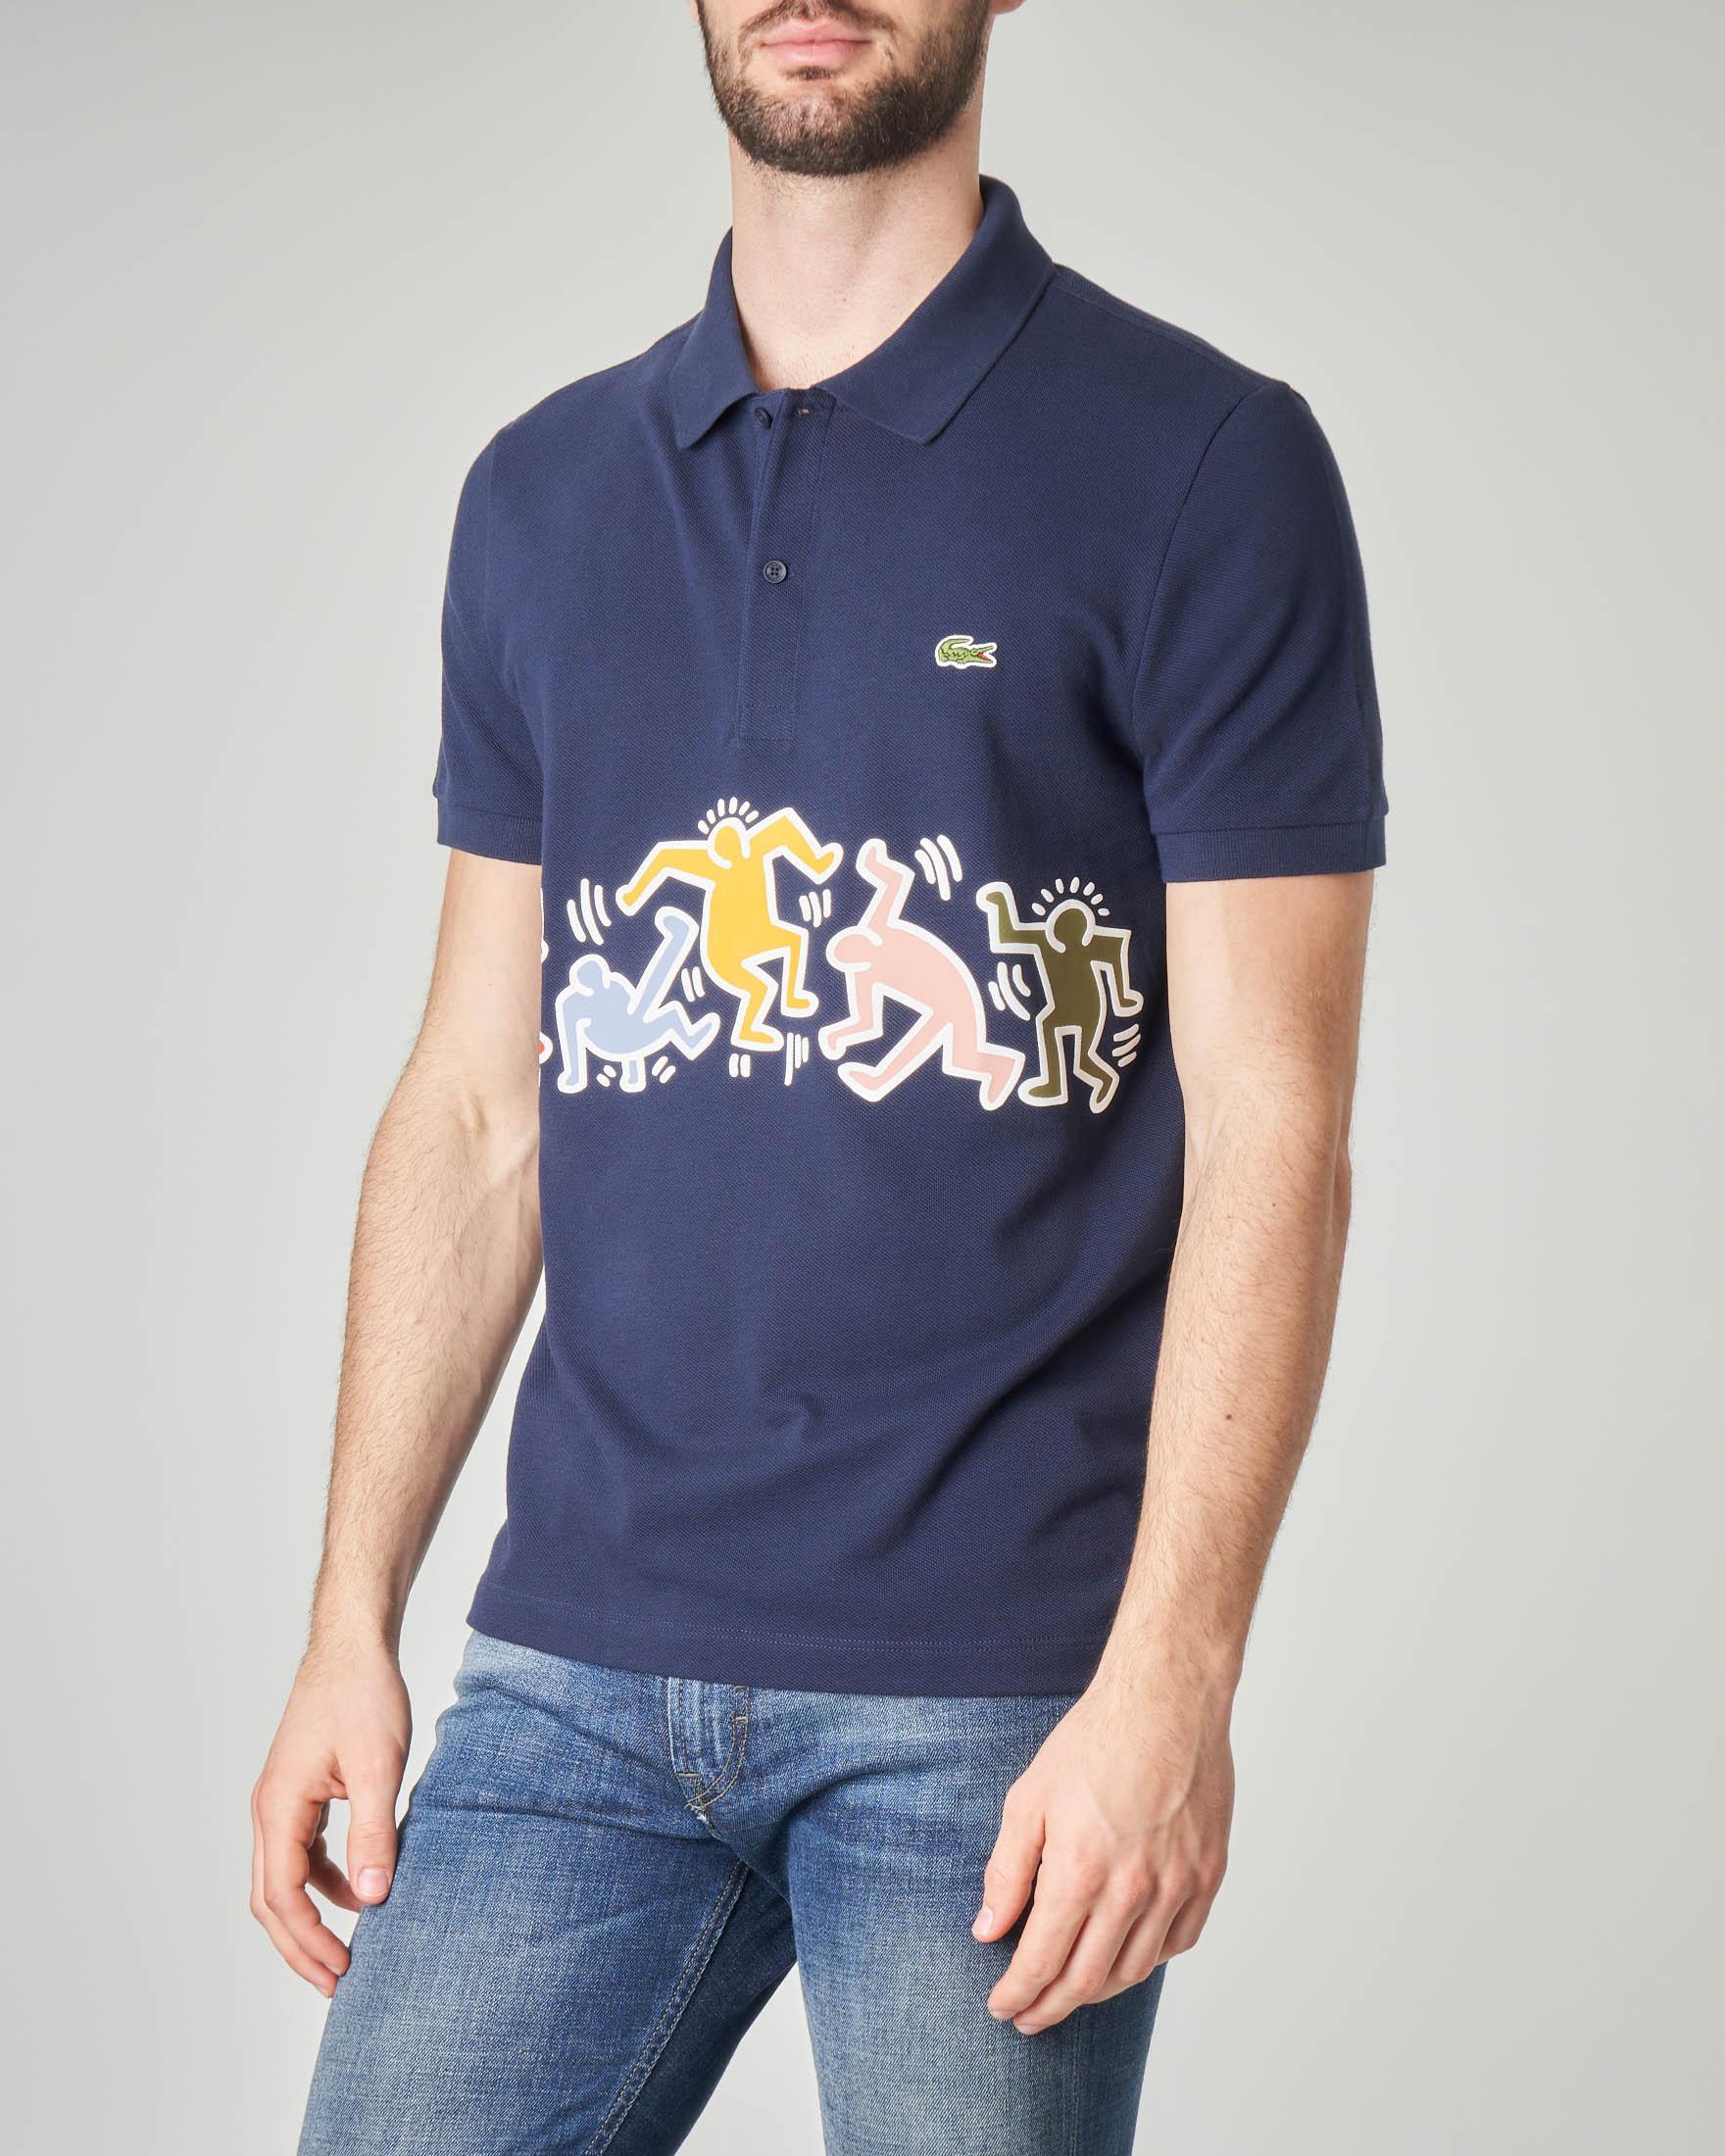 Polo blu con stampa Keith Haring davanti